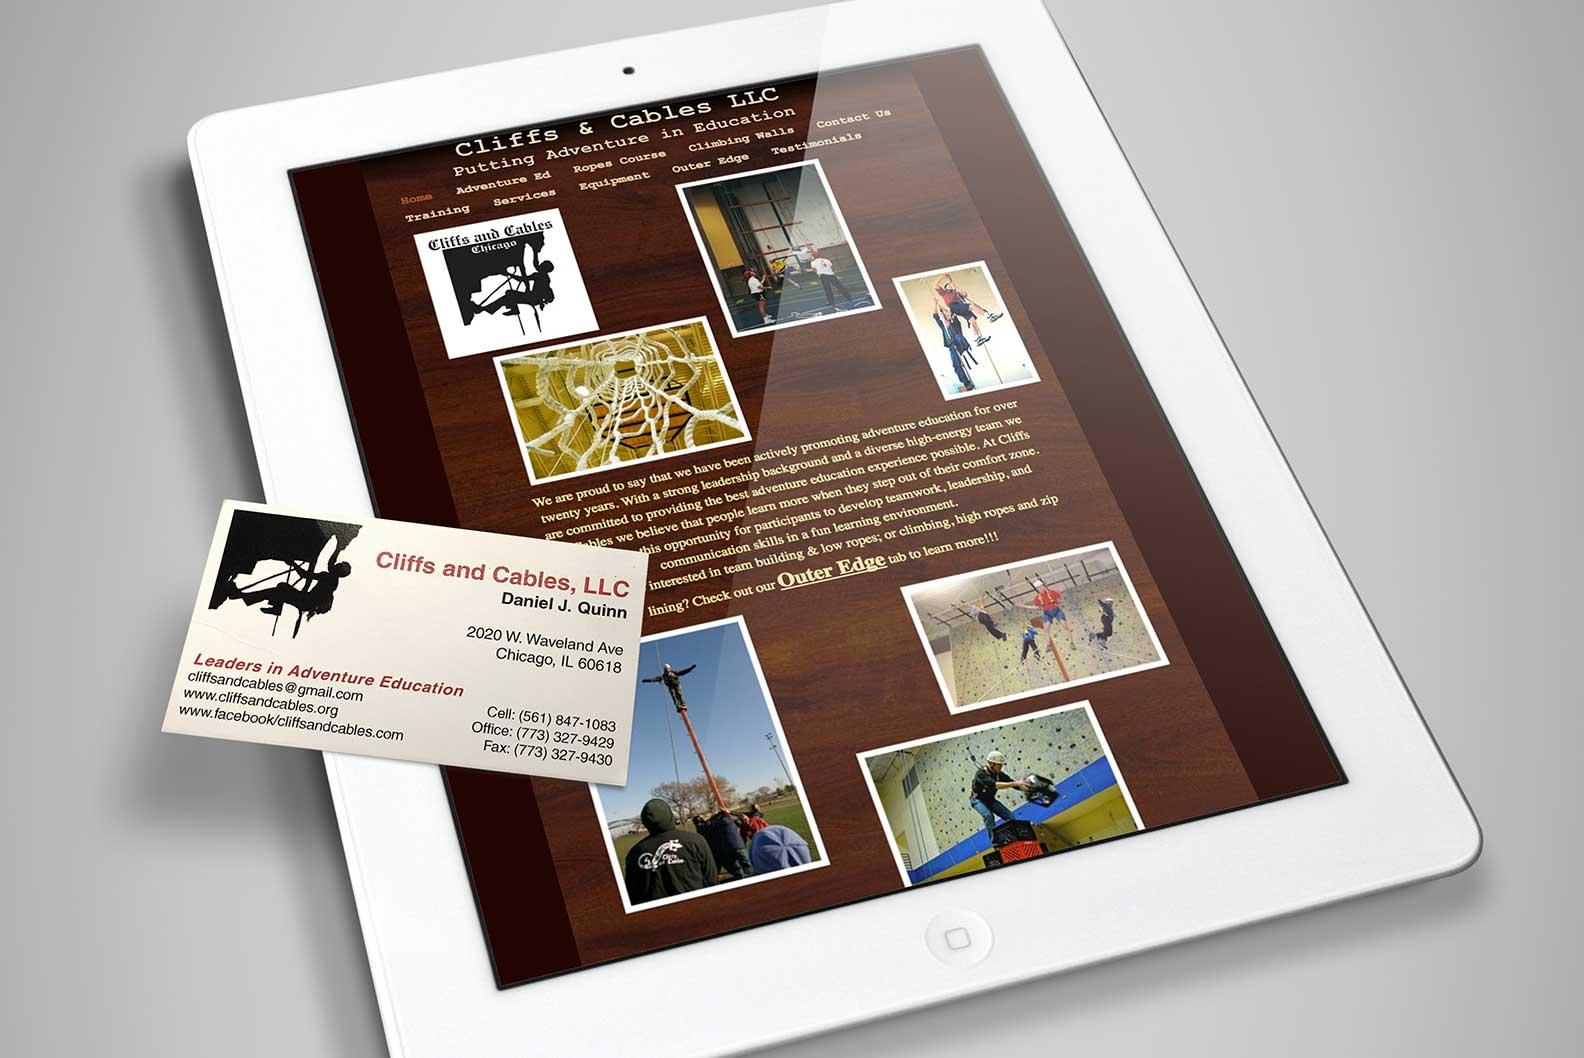 BEFORE:  The original logo, business card and website.